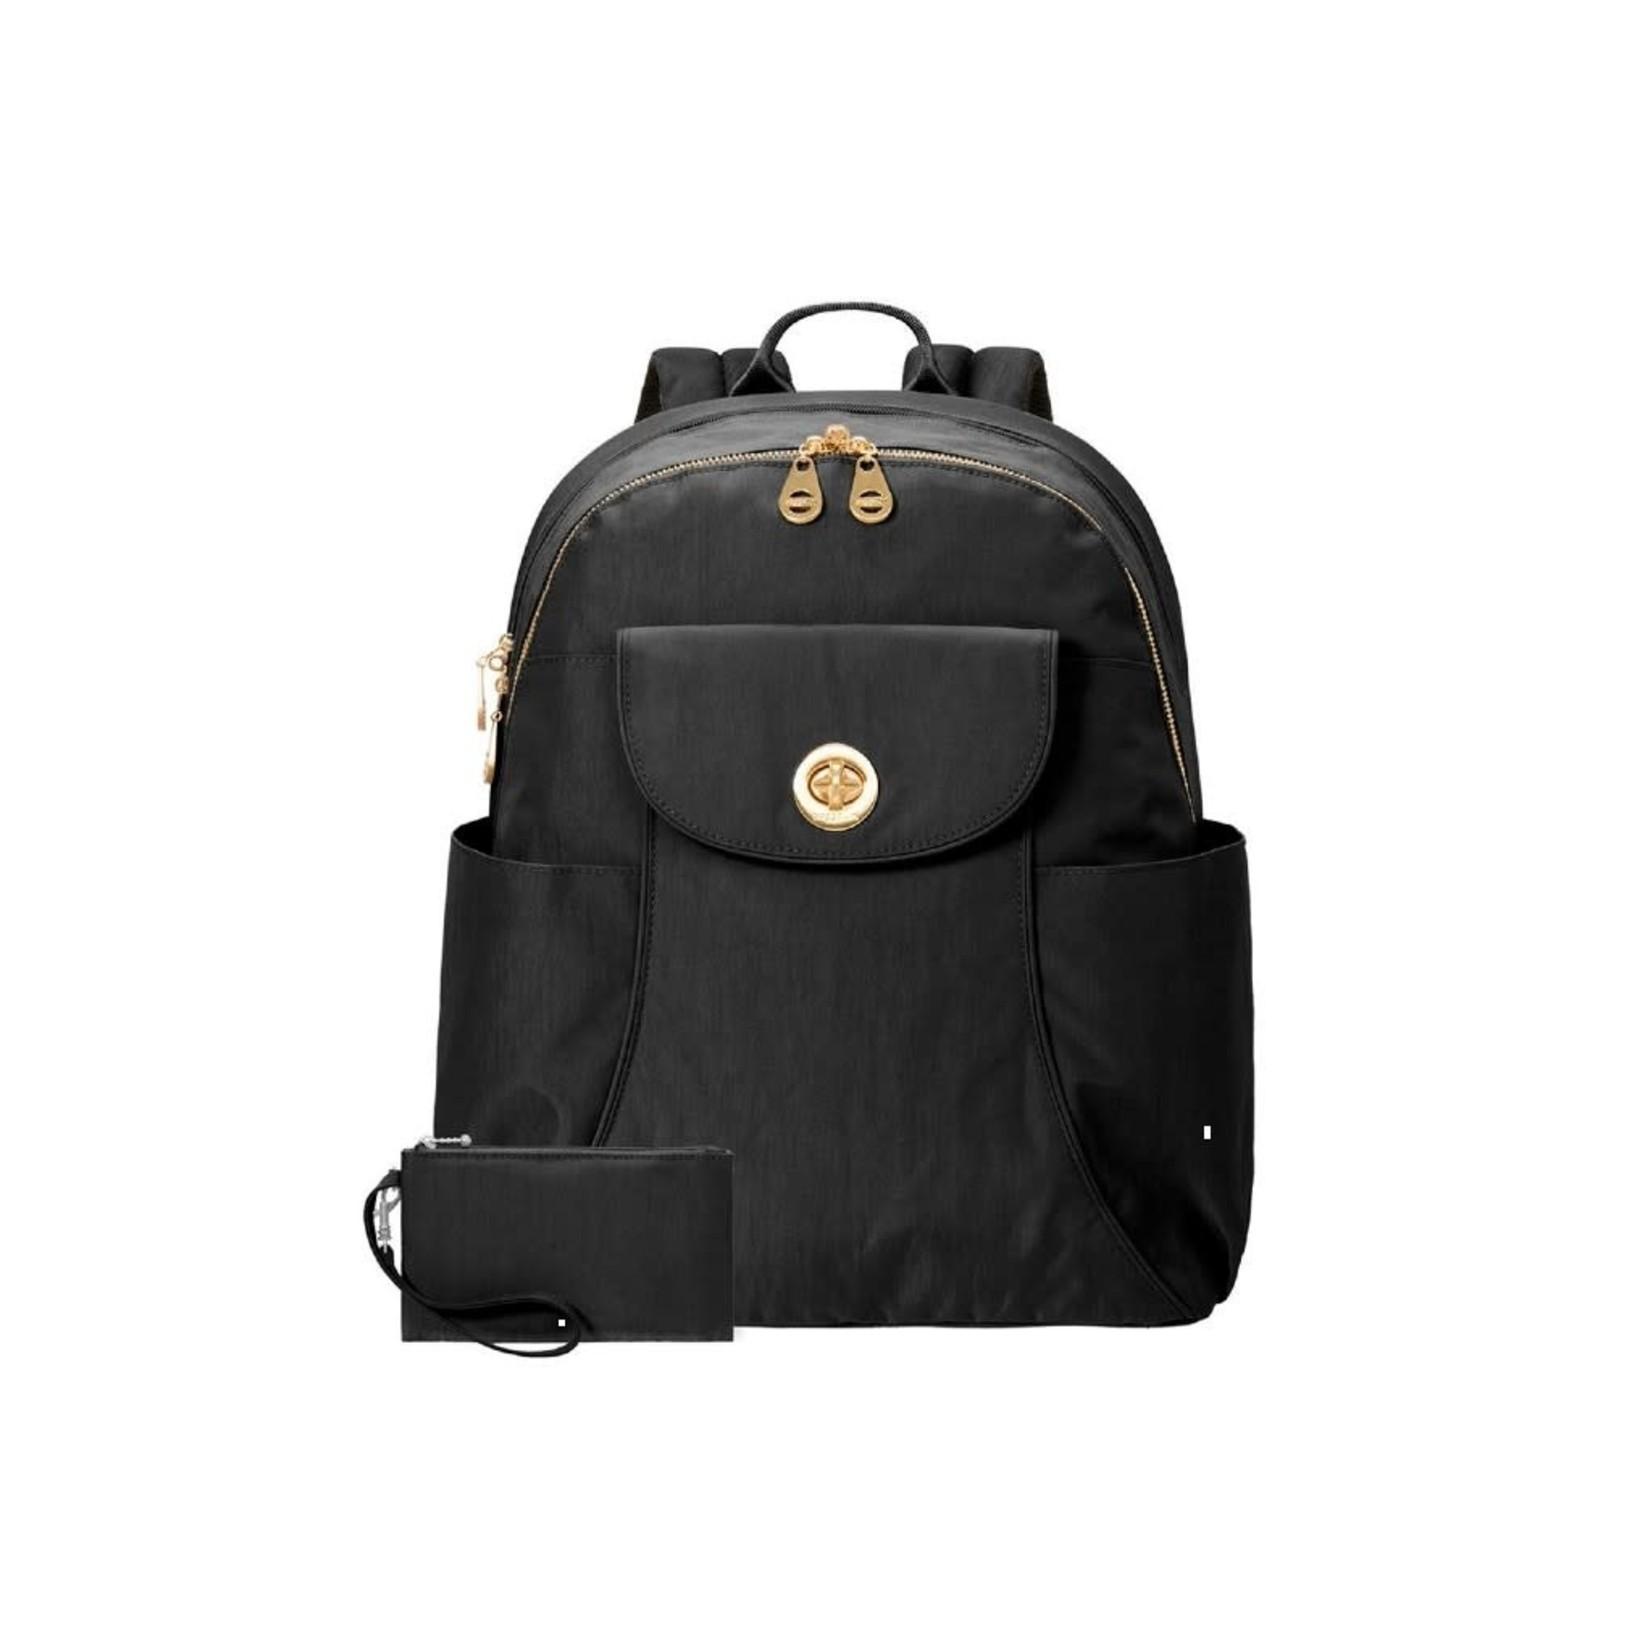 Baggallini Barcelona Laptop Backpack